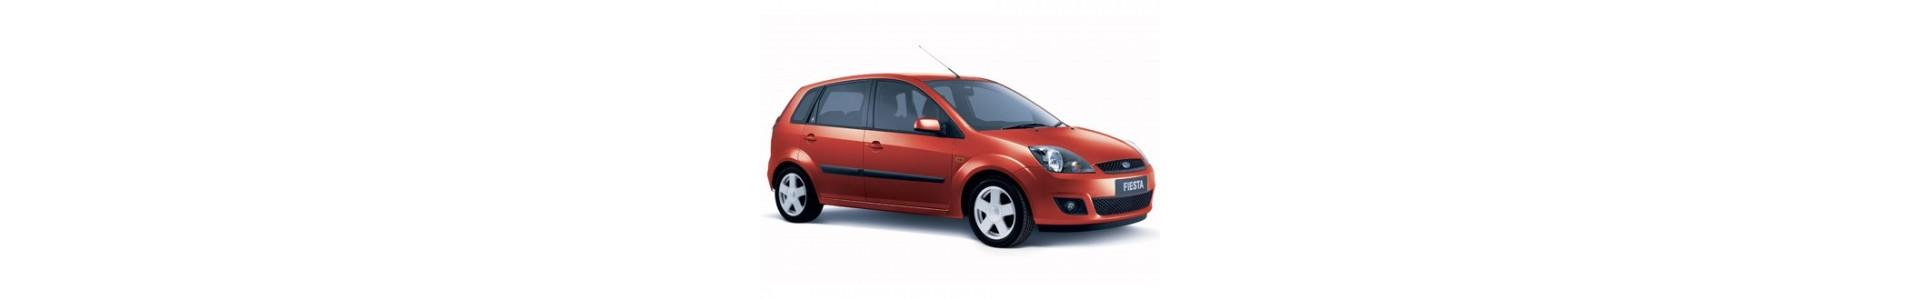 Fiesta 2001-2007